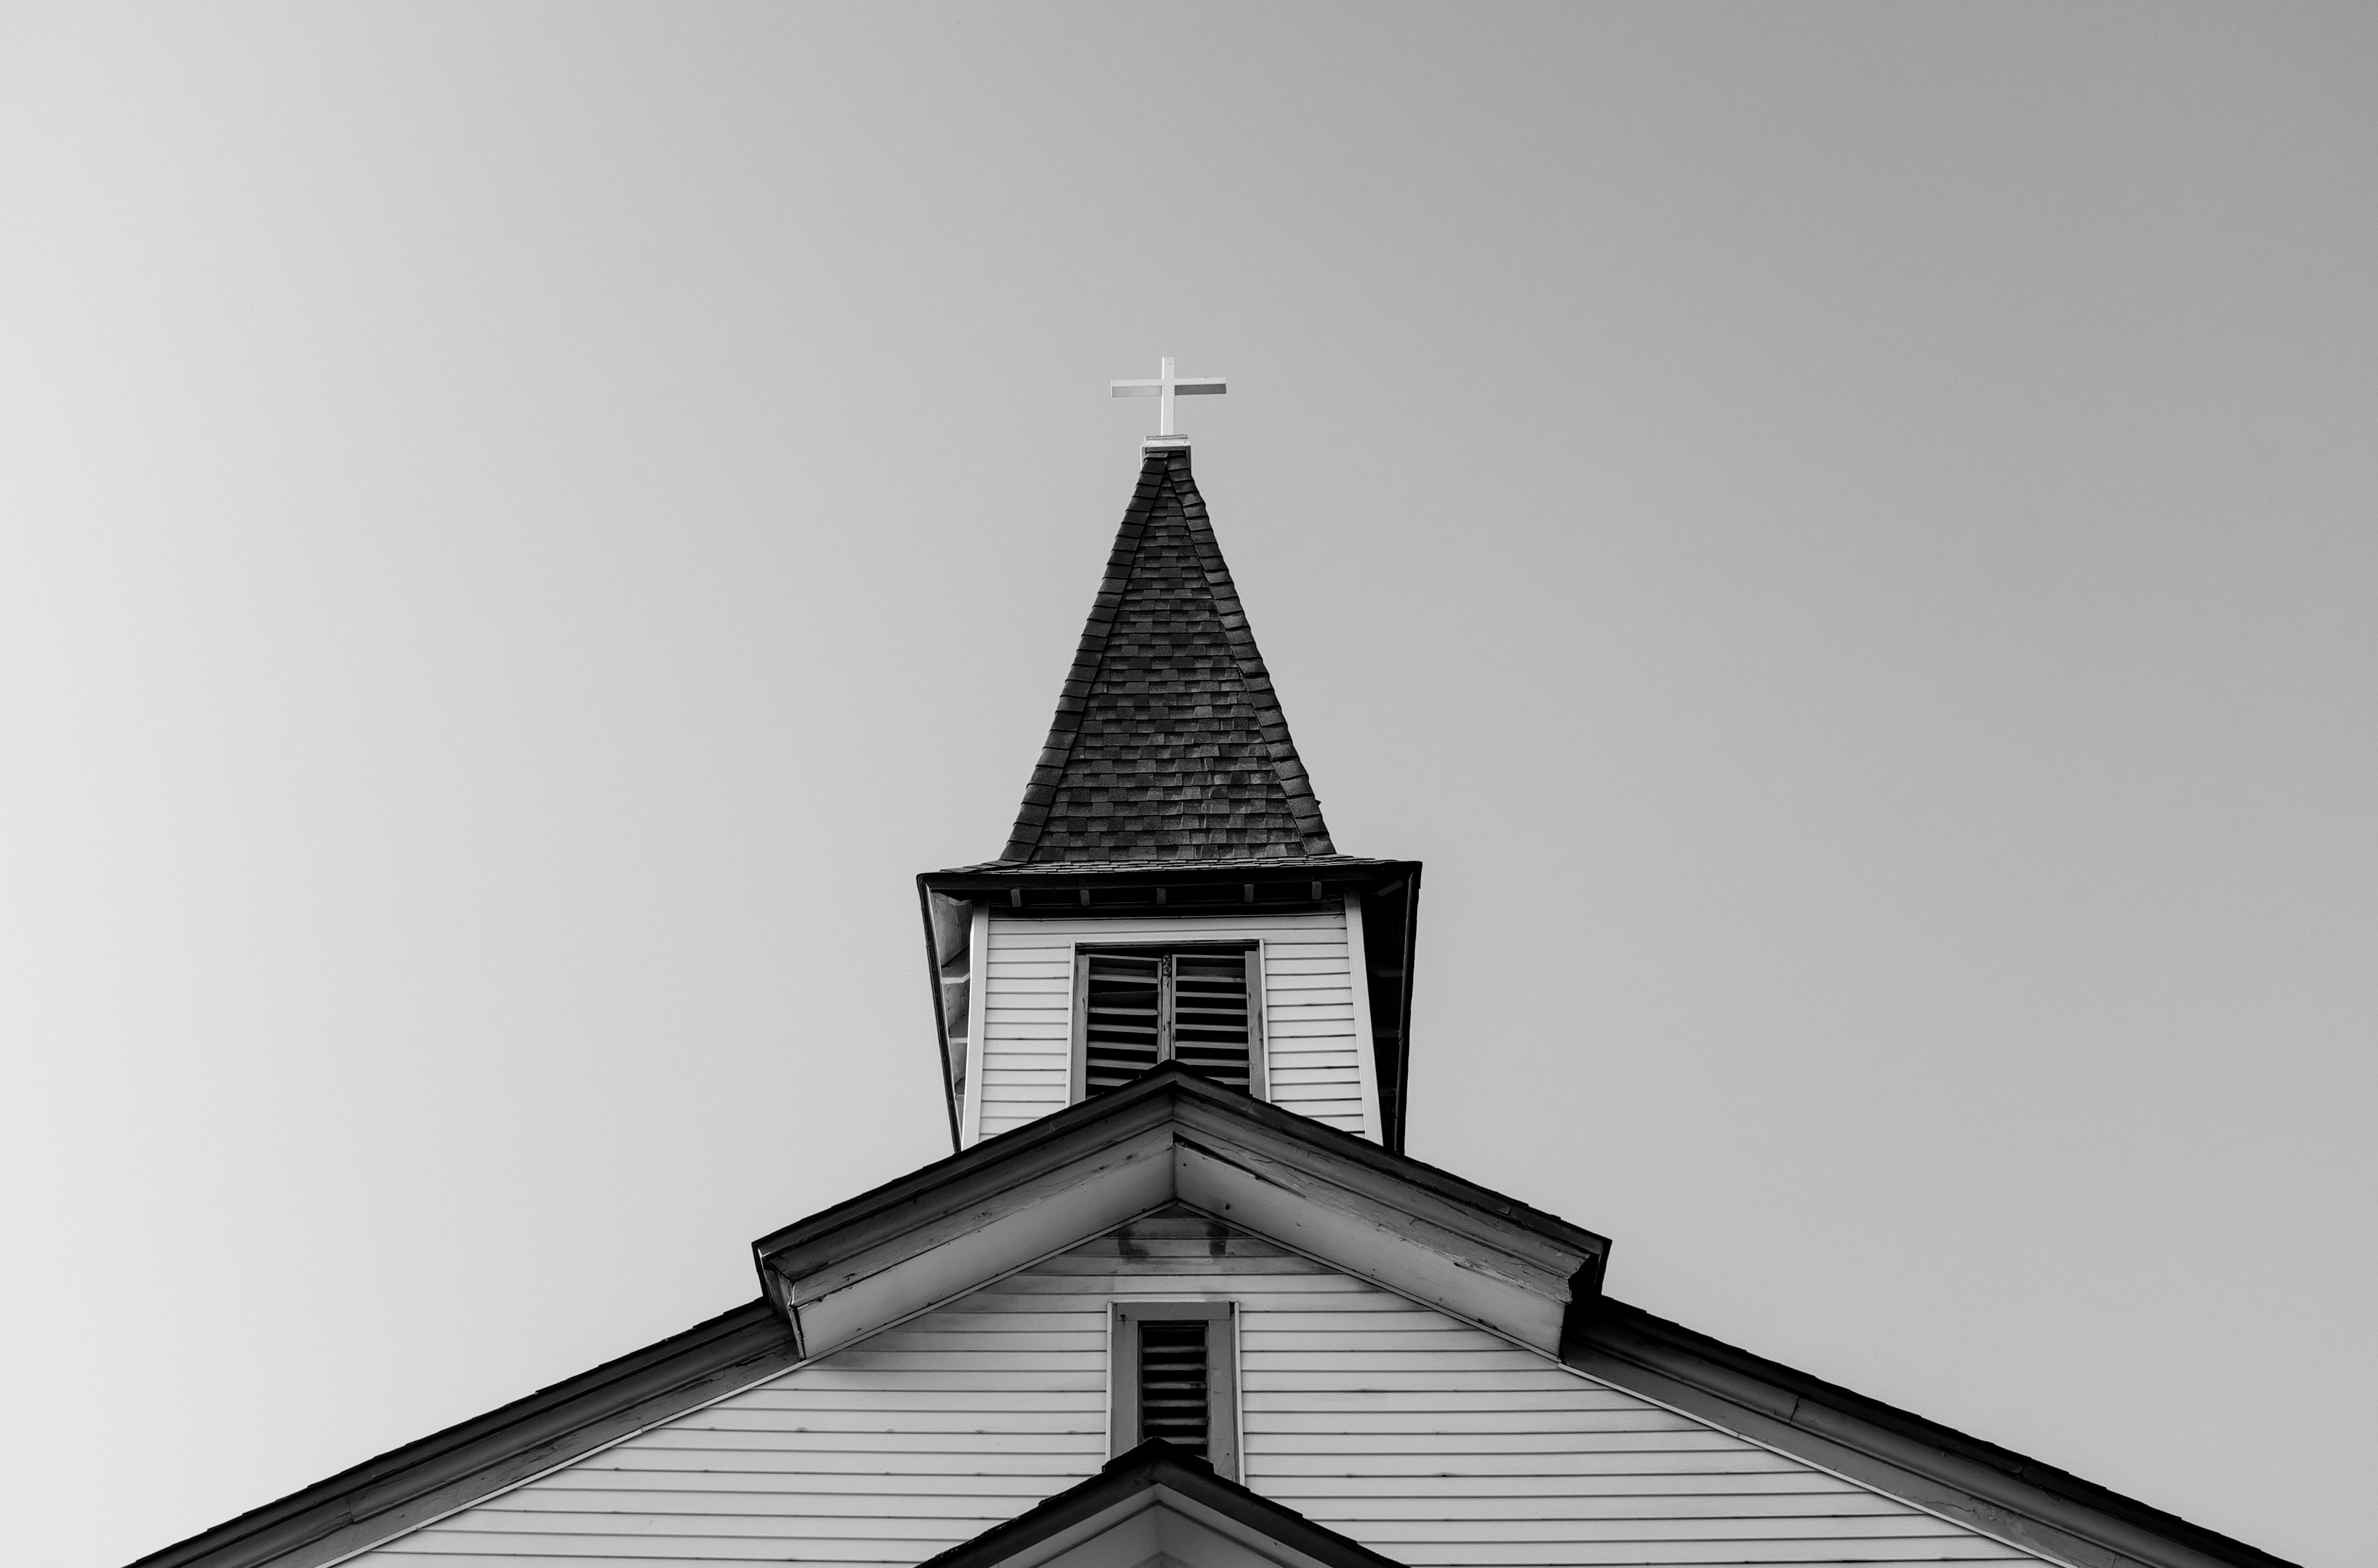 Church & State, pt. 1